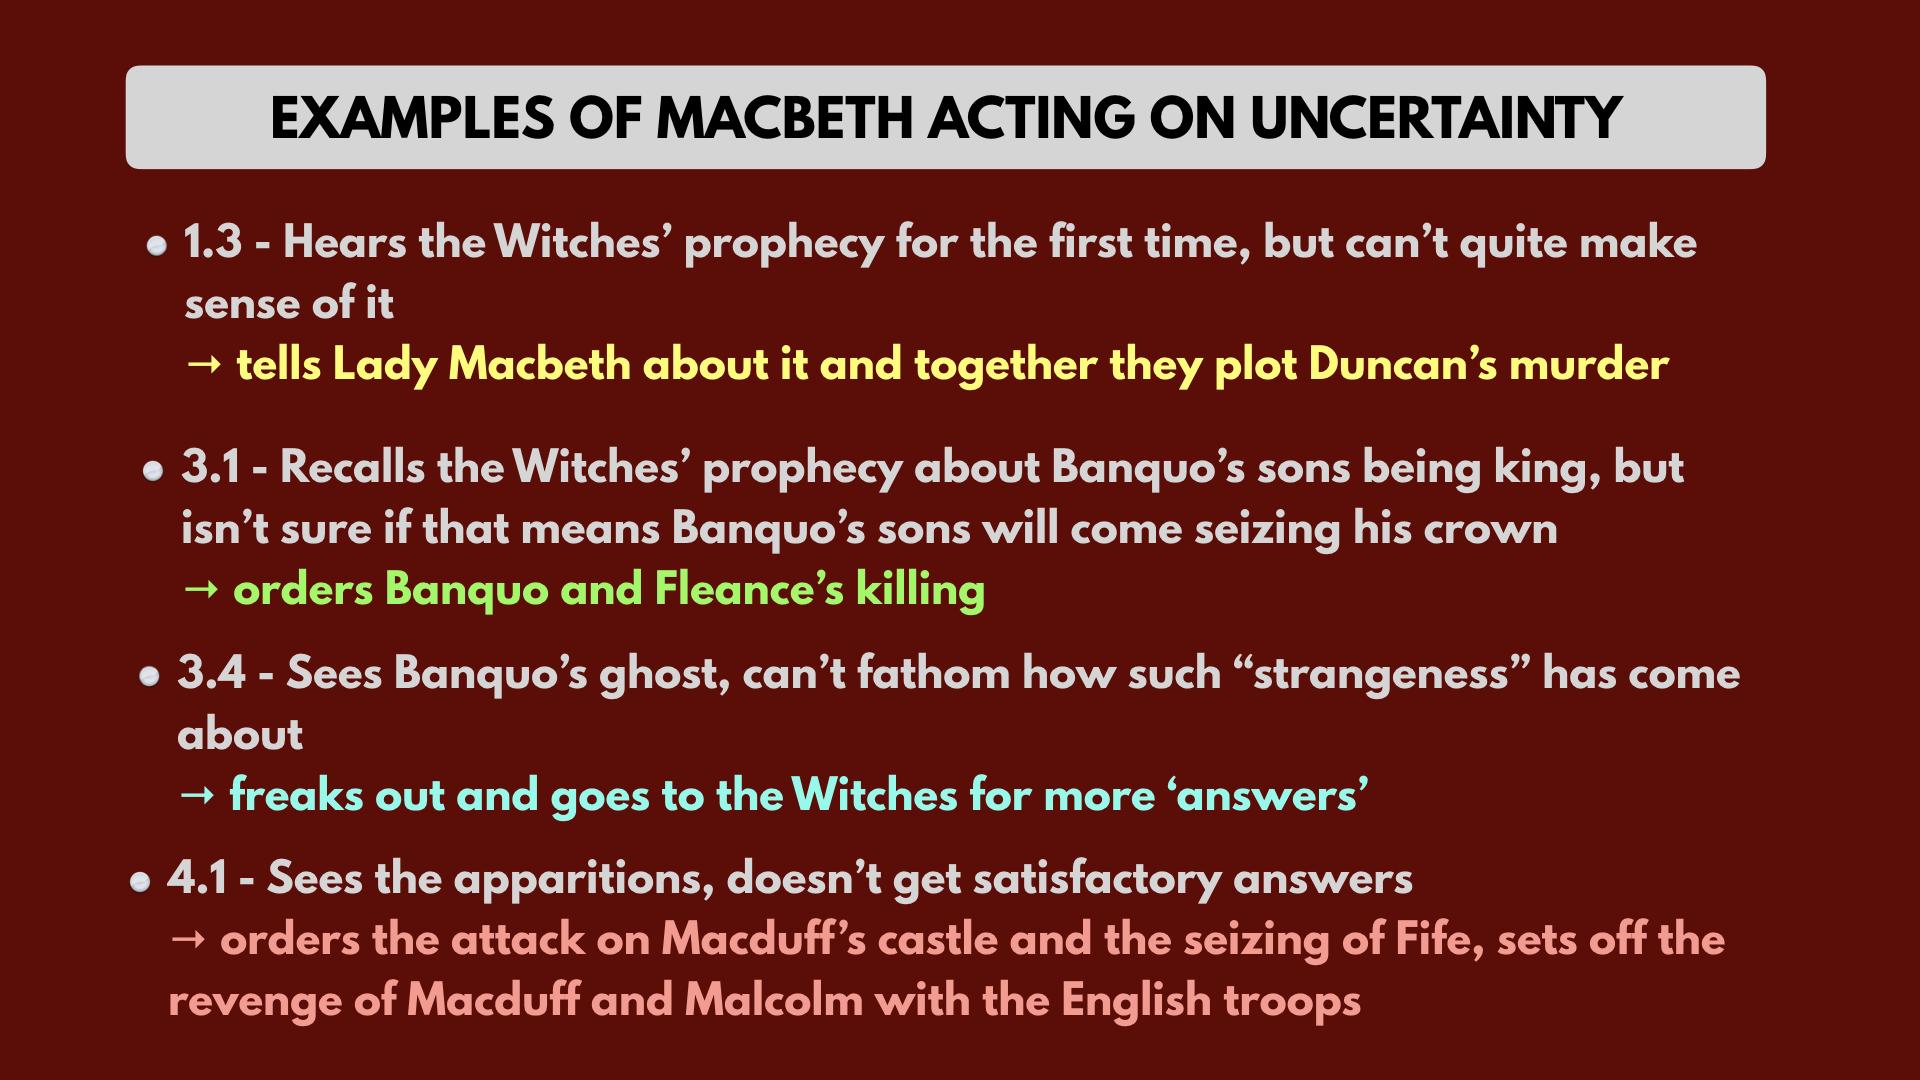 Macbeth uncertainty Shakespeare quotes analysis summary